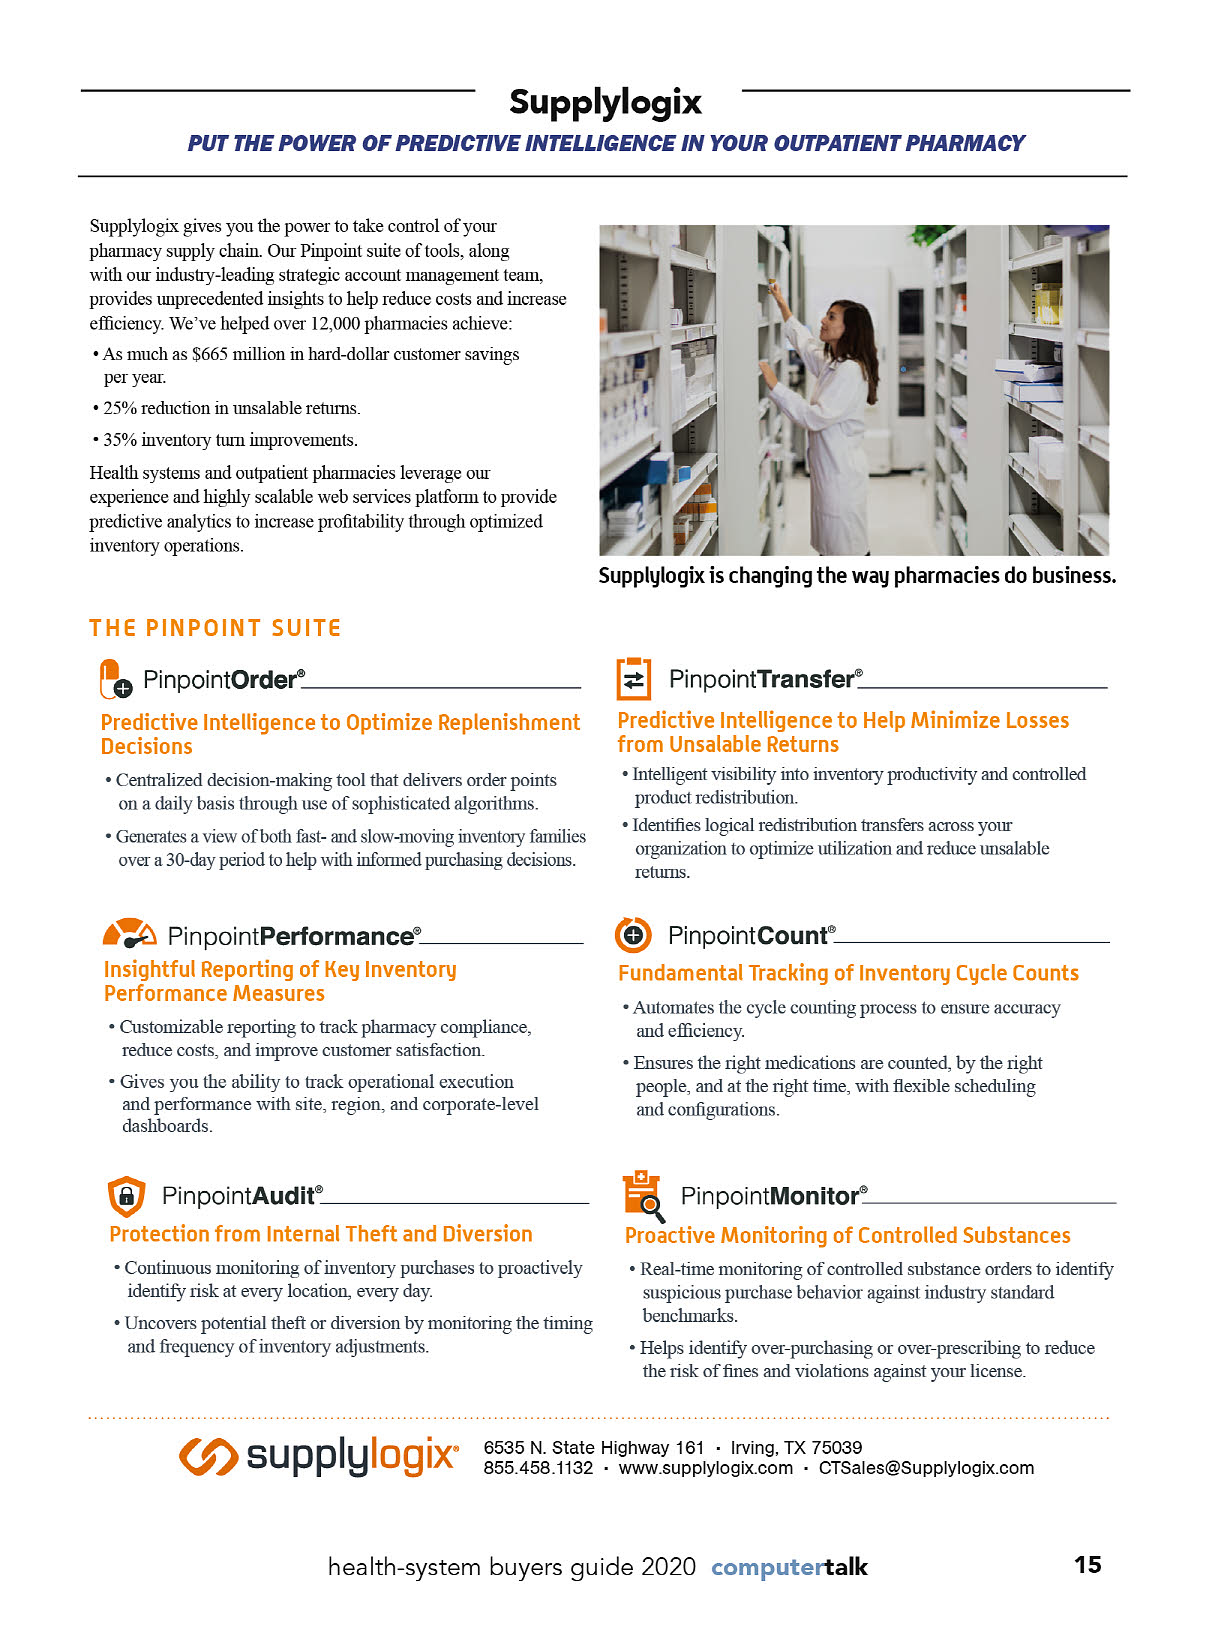 ComputerTalk_Health-System_Buyers_Guide_2020_Supplylogix